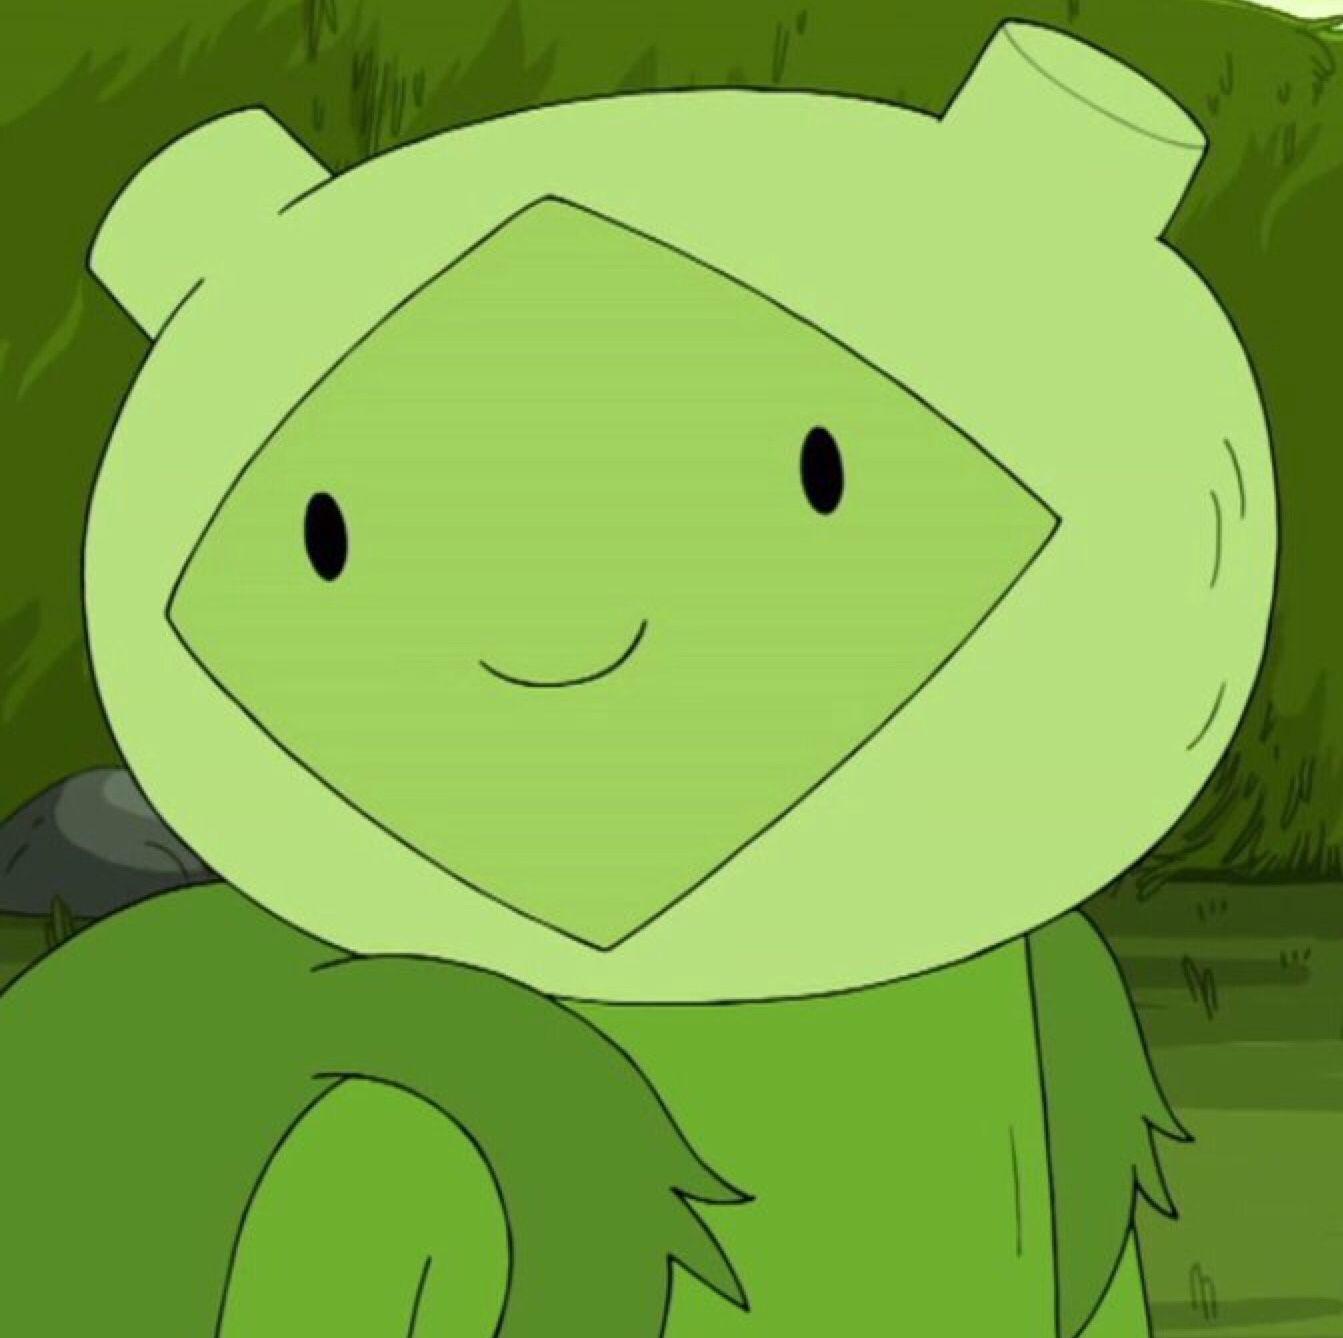 I Love This Grass Child Adventure Time Cartoon Shows Cartoon